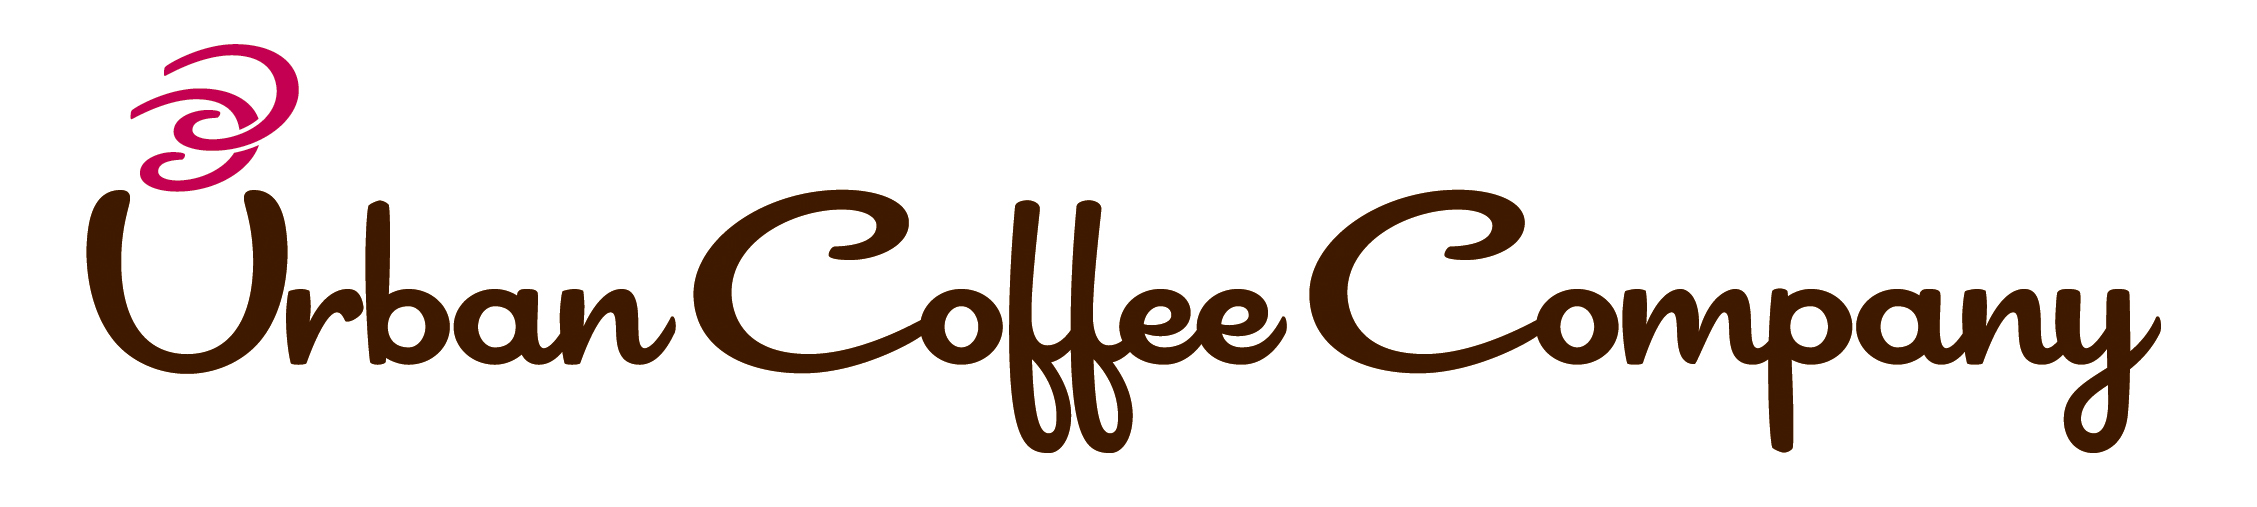 urbancoffee.jpg